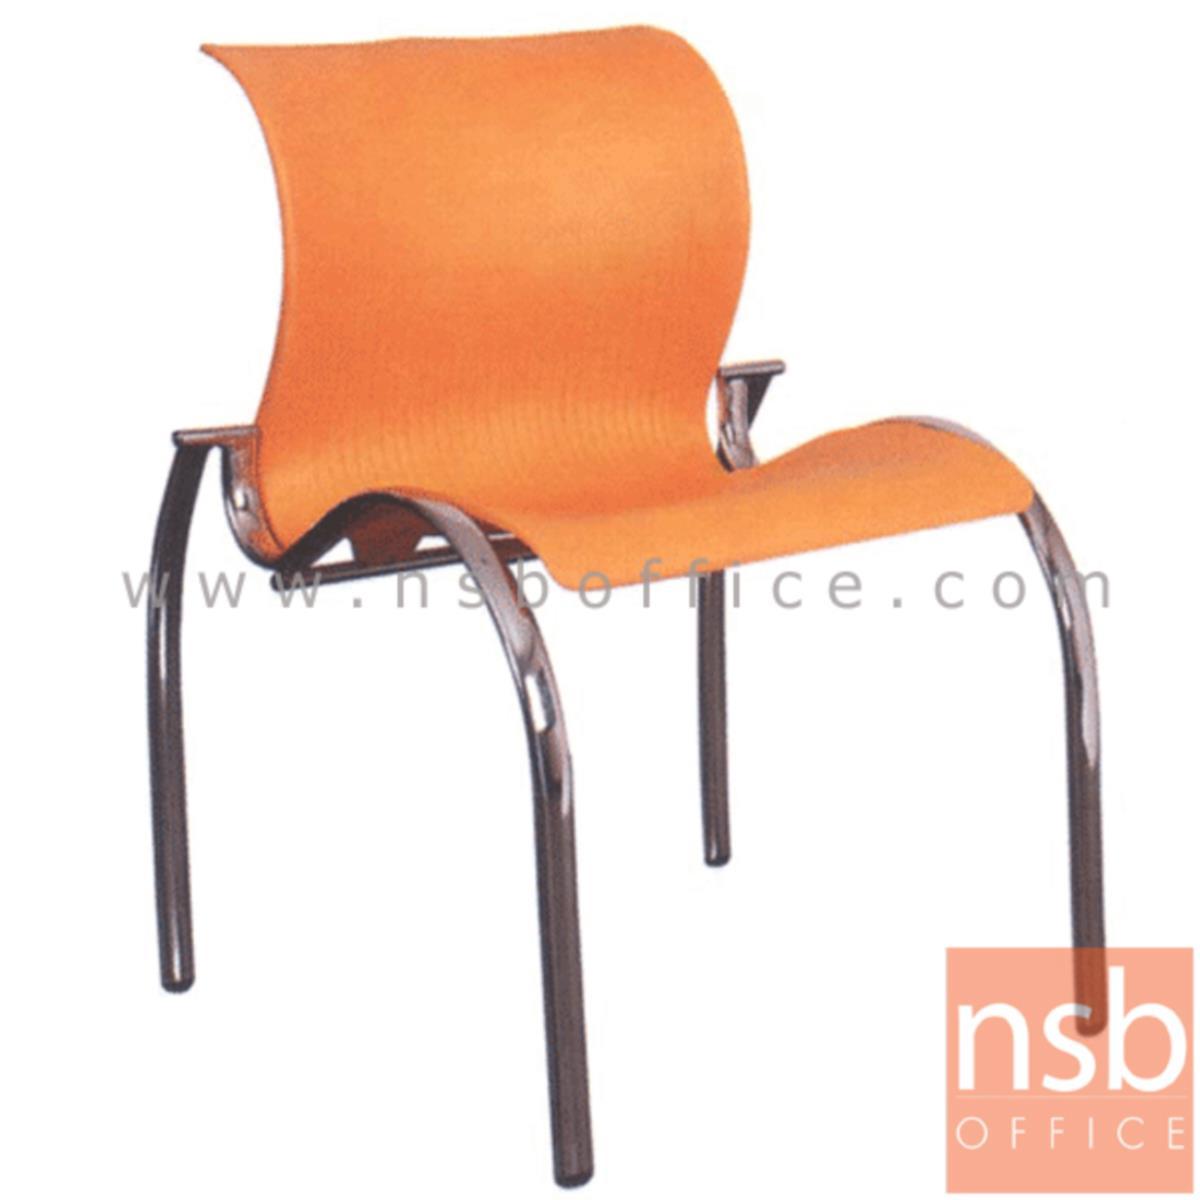 B05A038:เก้าอี้อเนกประสงค์เฟรมโพลี่ รุ่น A4-501 ขาเหล็ก